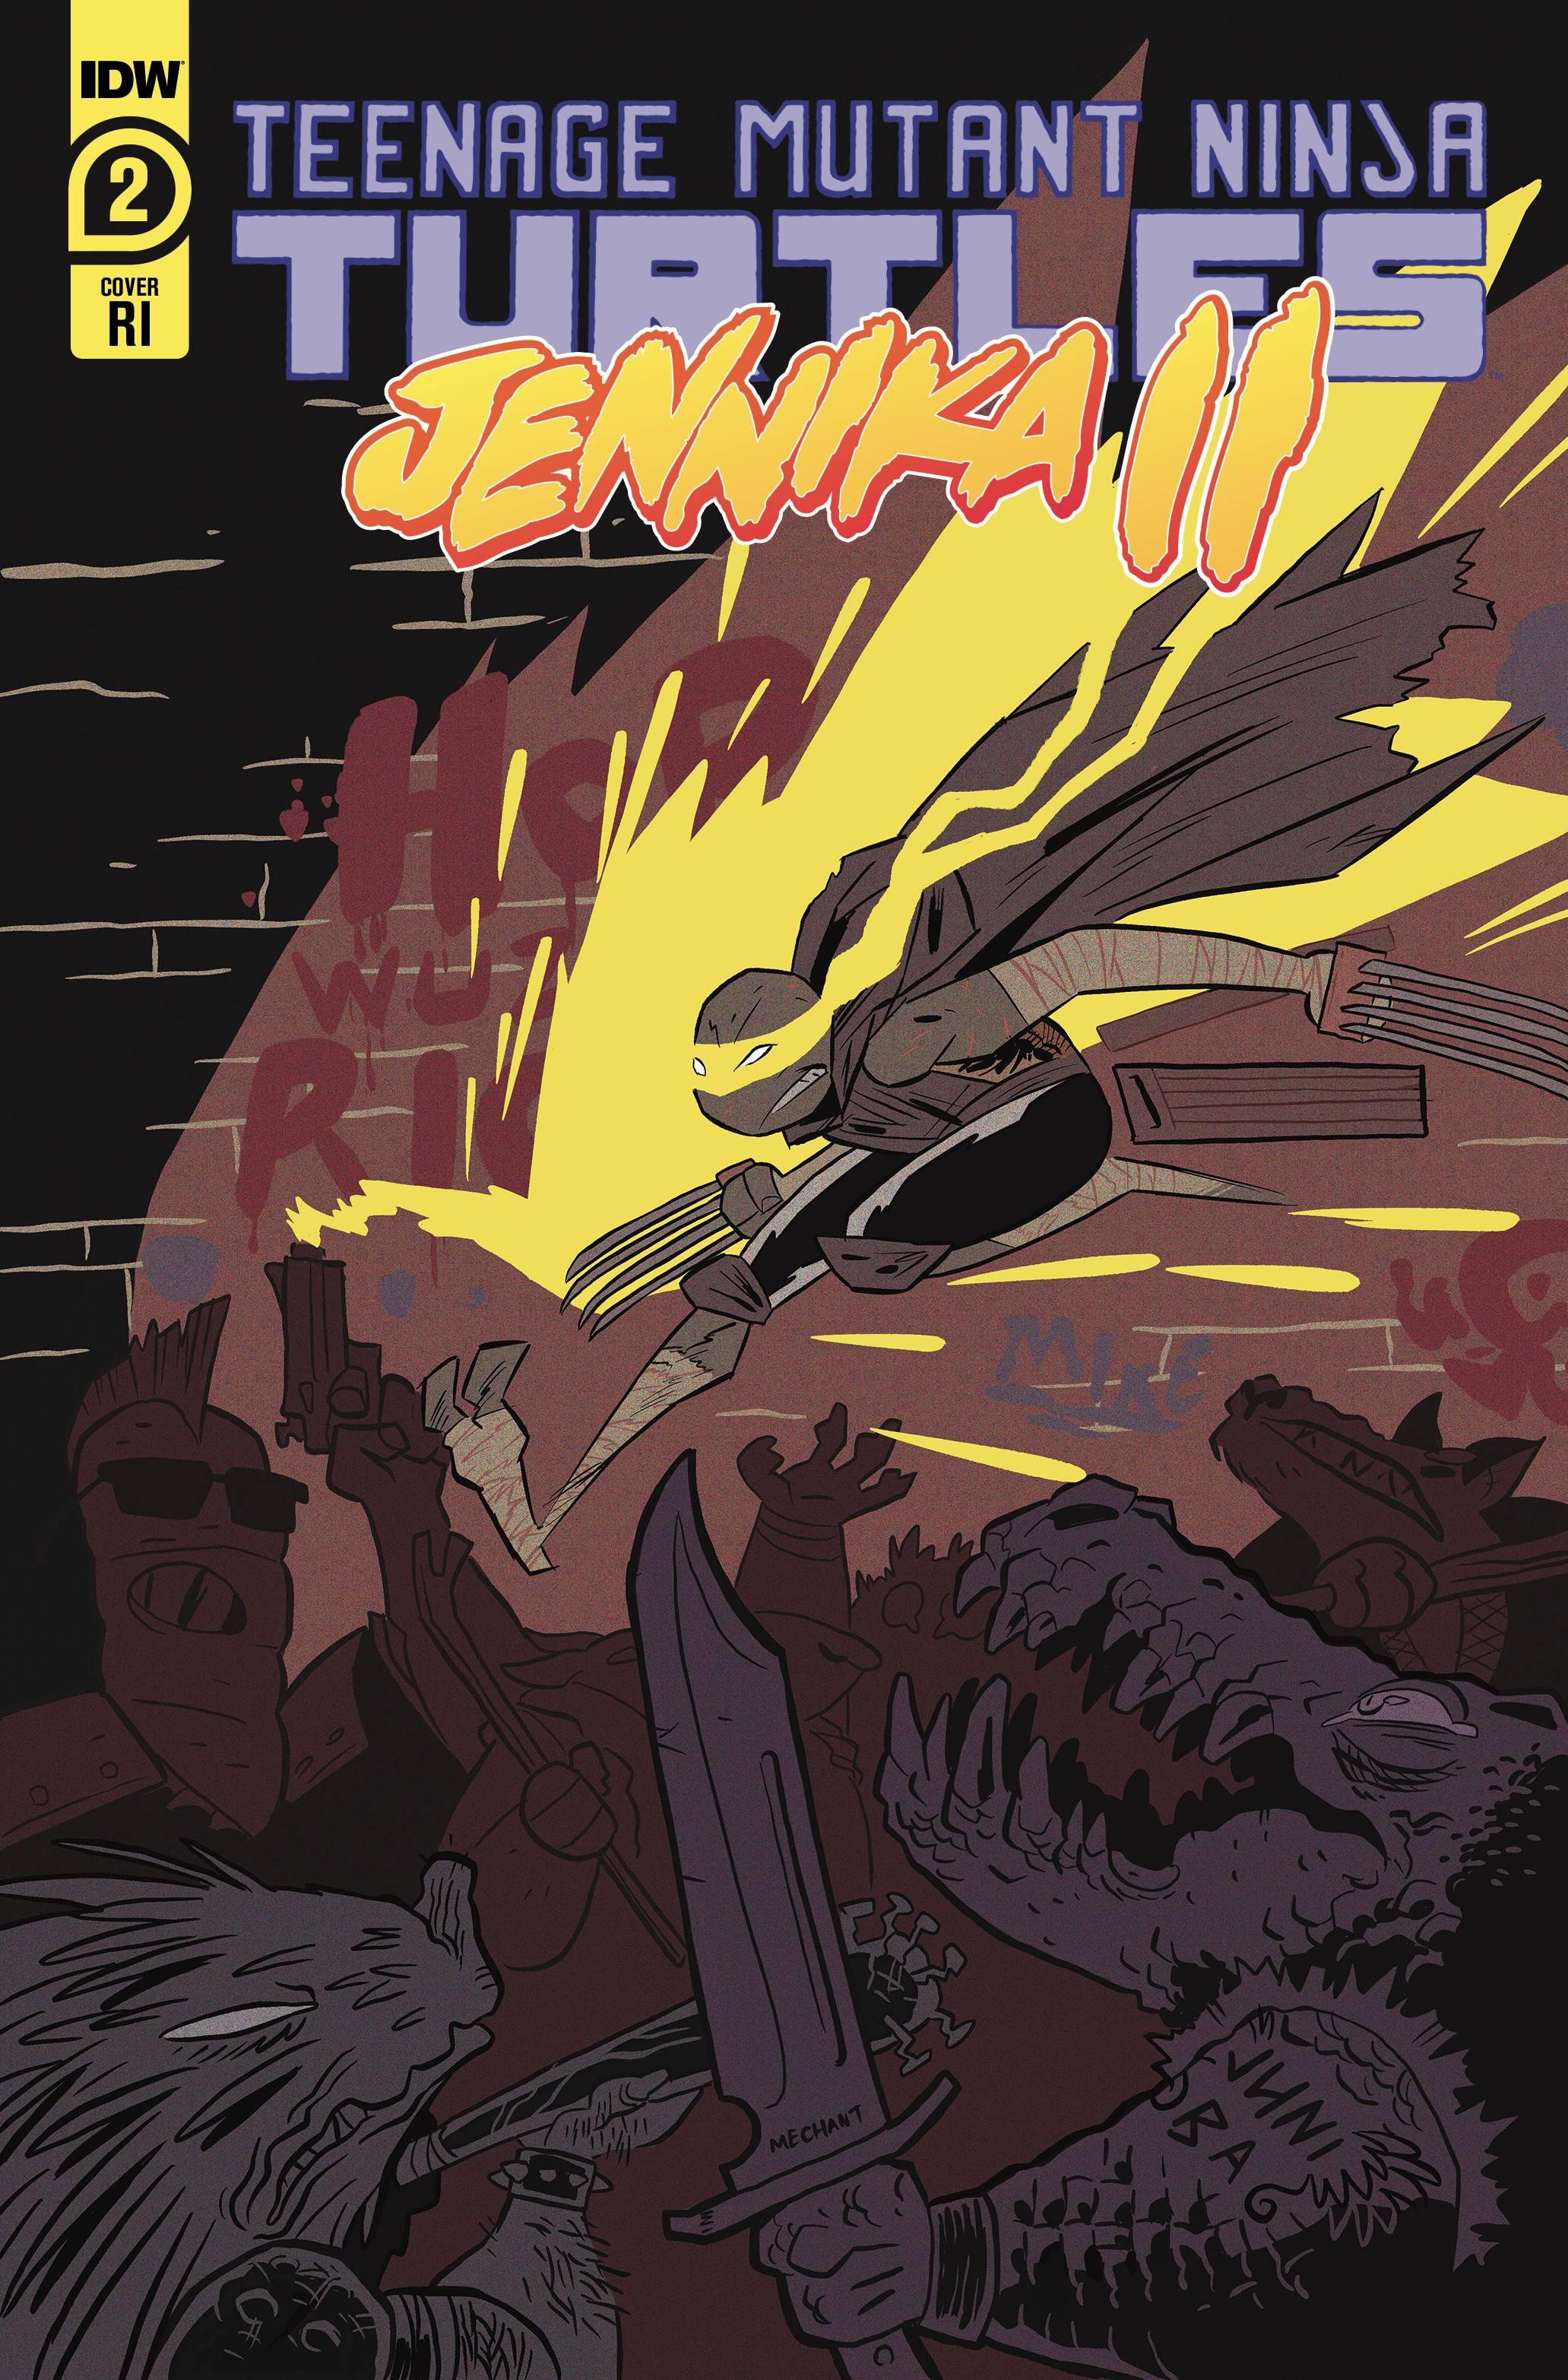 TMNT JENNIKA II #2 (OF 6) 10 COPY JUNI BA INCV CVR